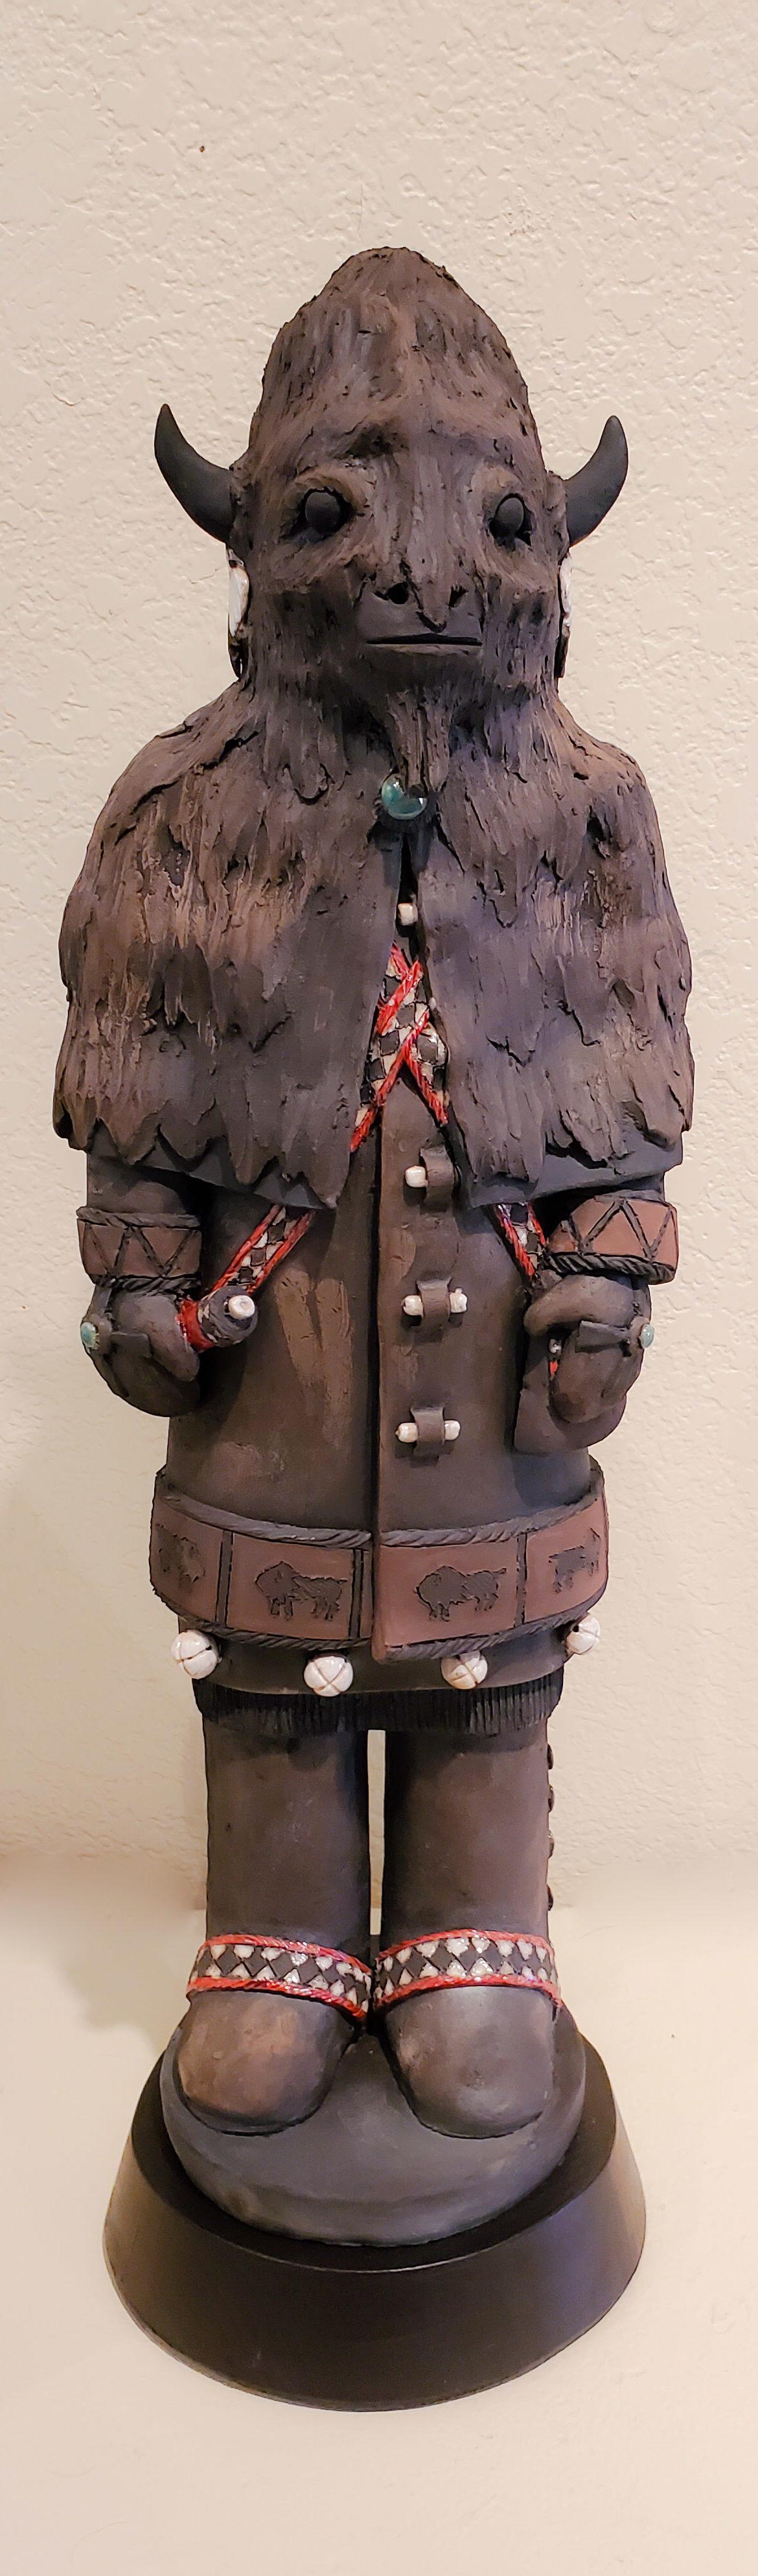 Buffalo #1, John Booth, Ceramic Sculpture, Rogoway Gallery